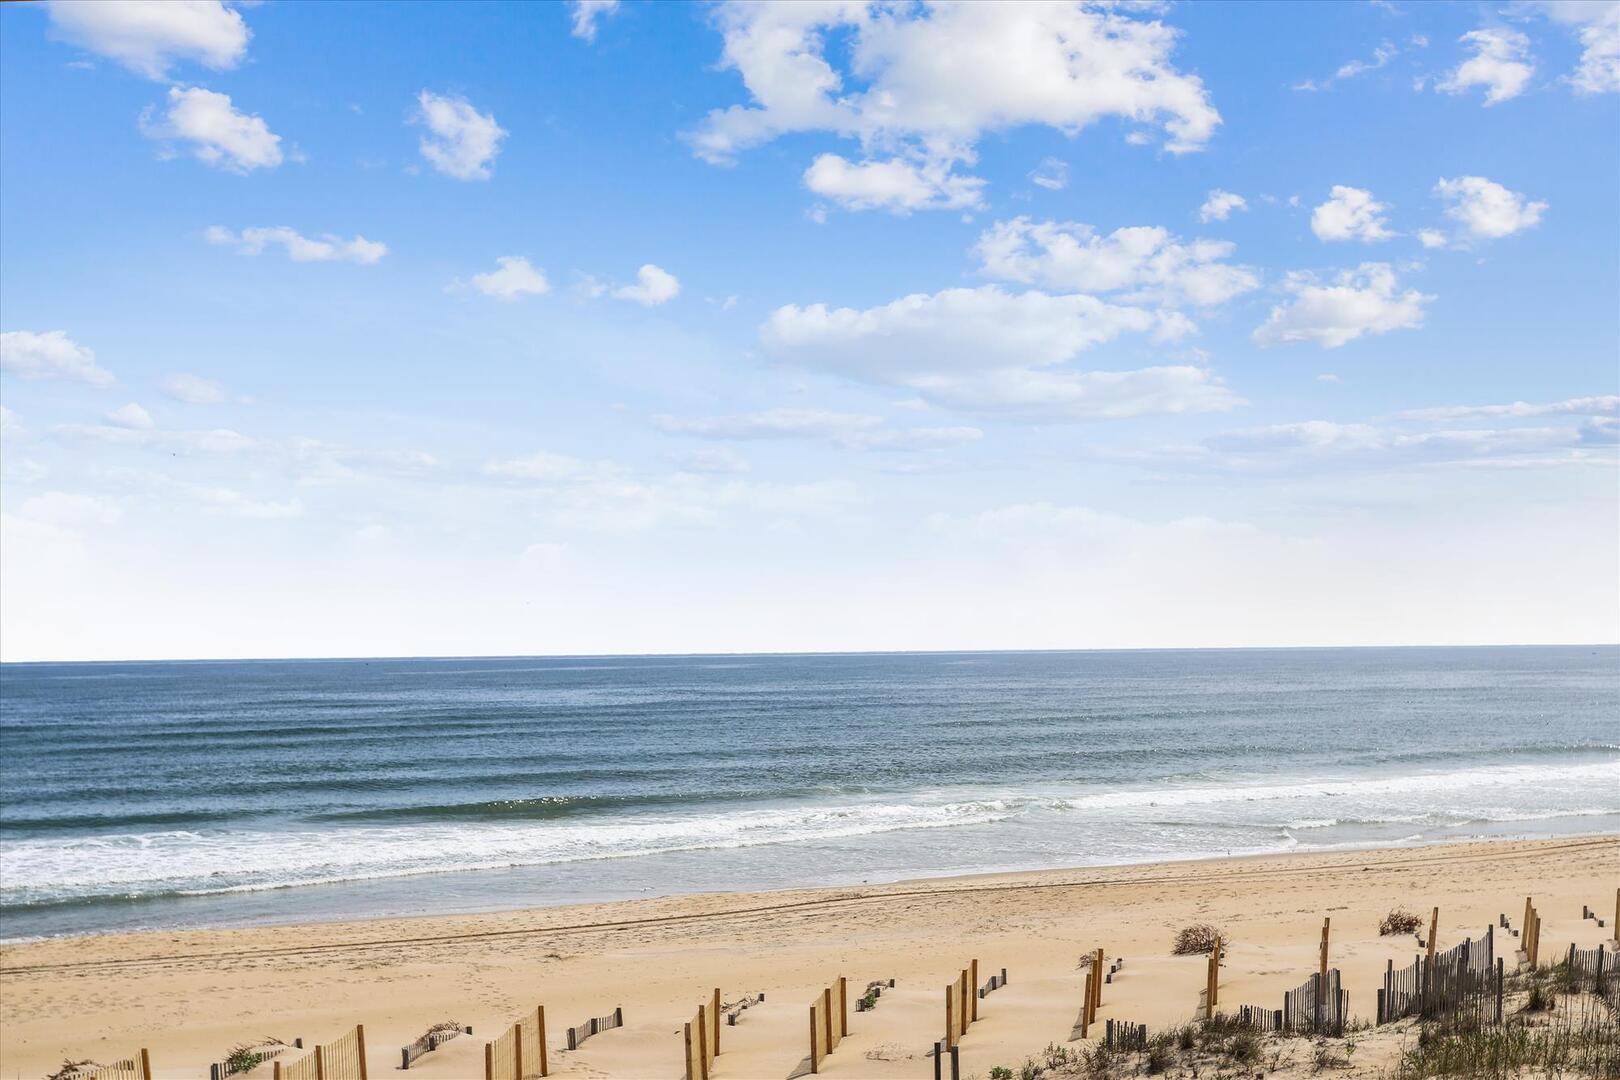 Exterior,Beach,